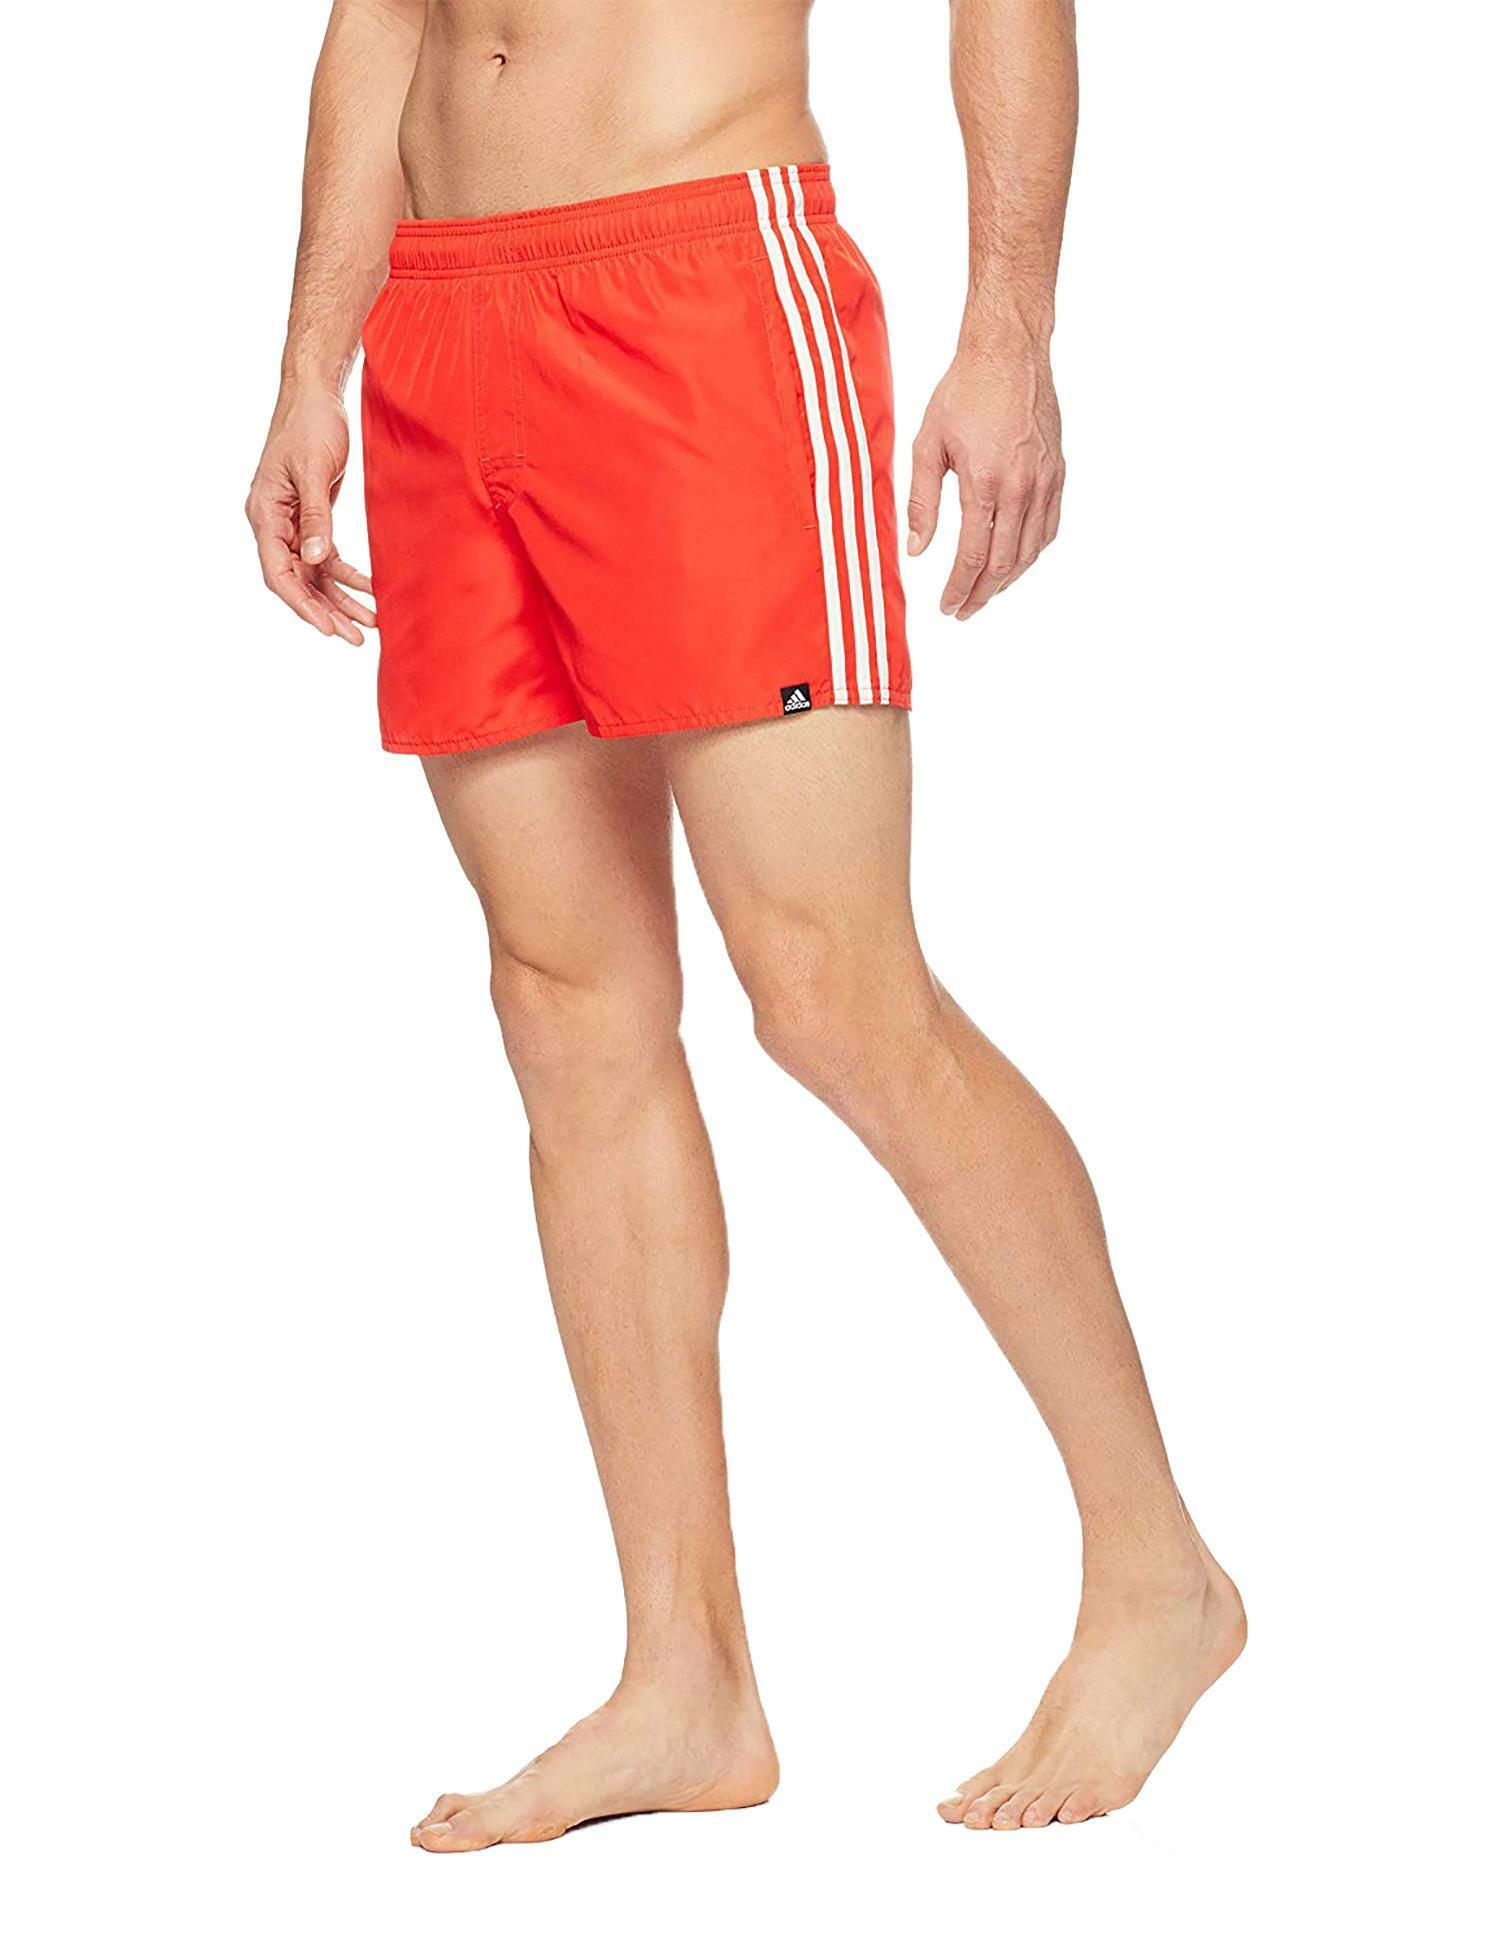 costume adidas rosso uomo